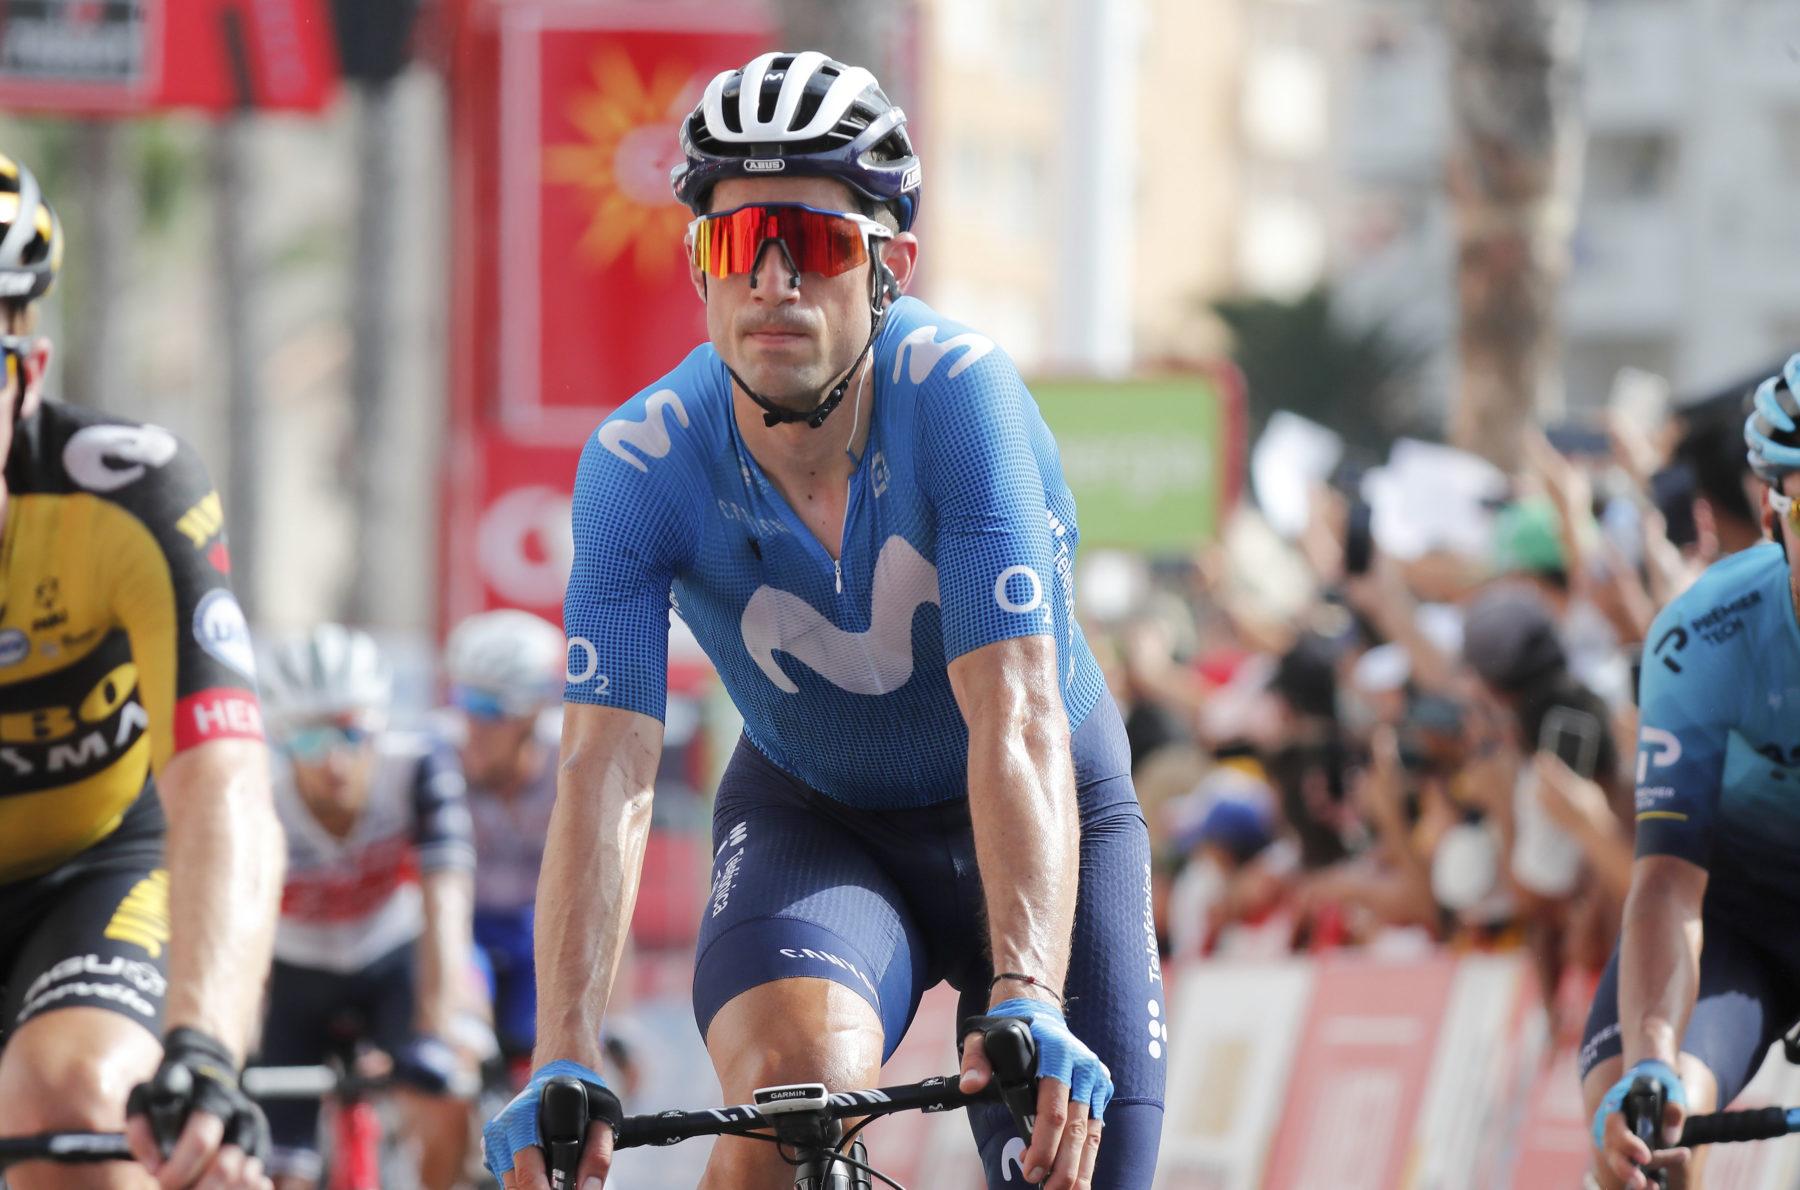 Imagen de la noticia 'Blues safe through stage 8 before Velefique; Valverde undergoes surgery in Murcia'